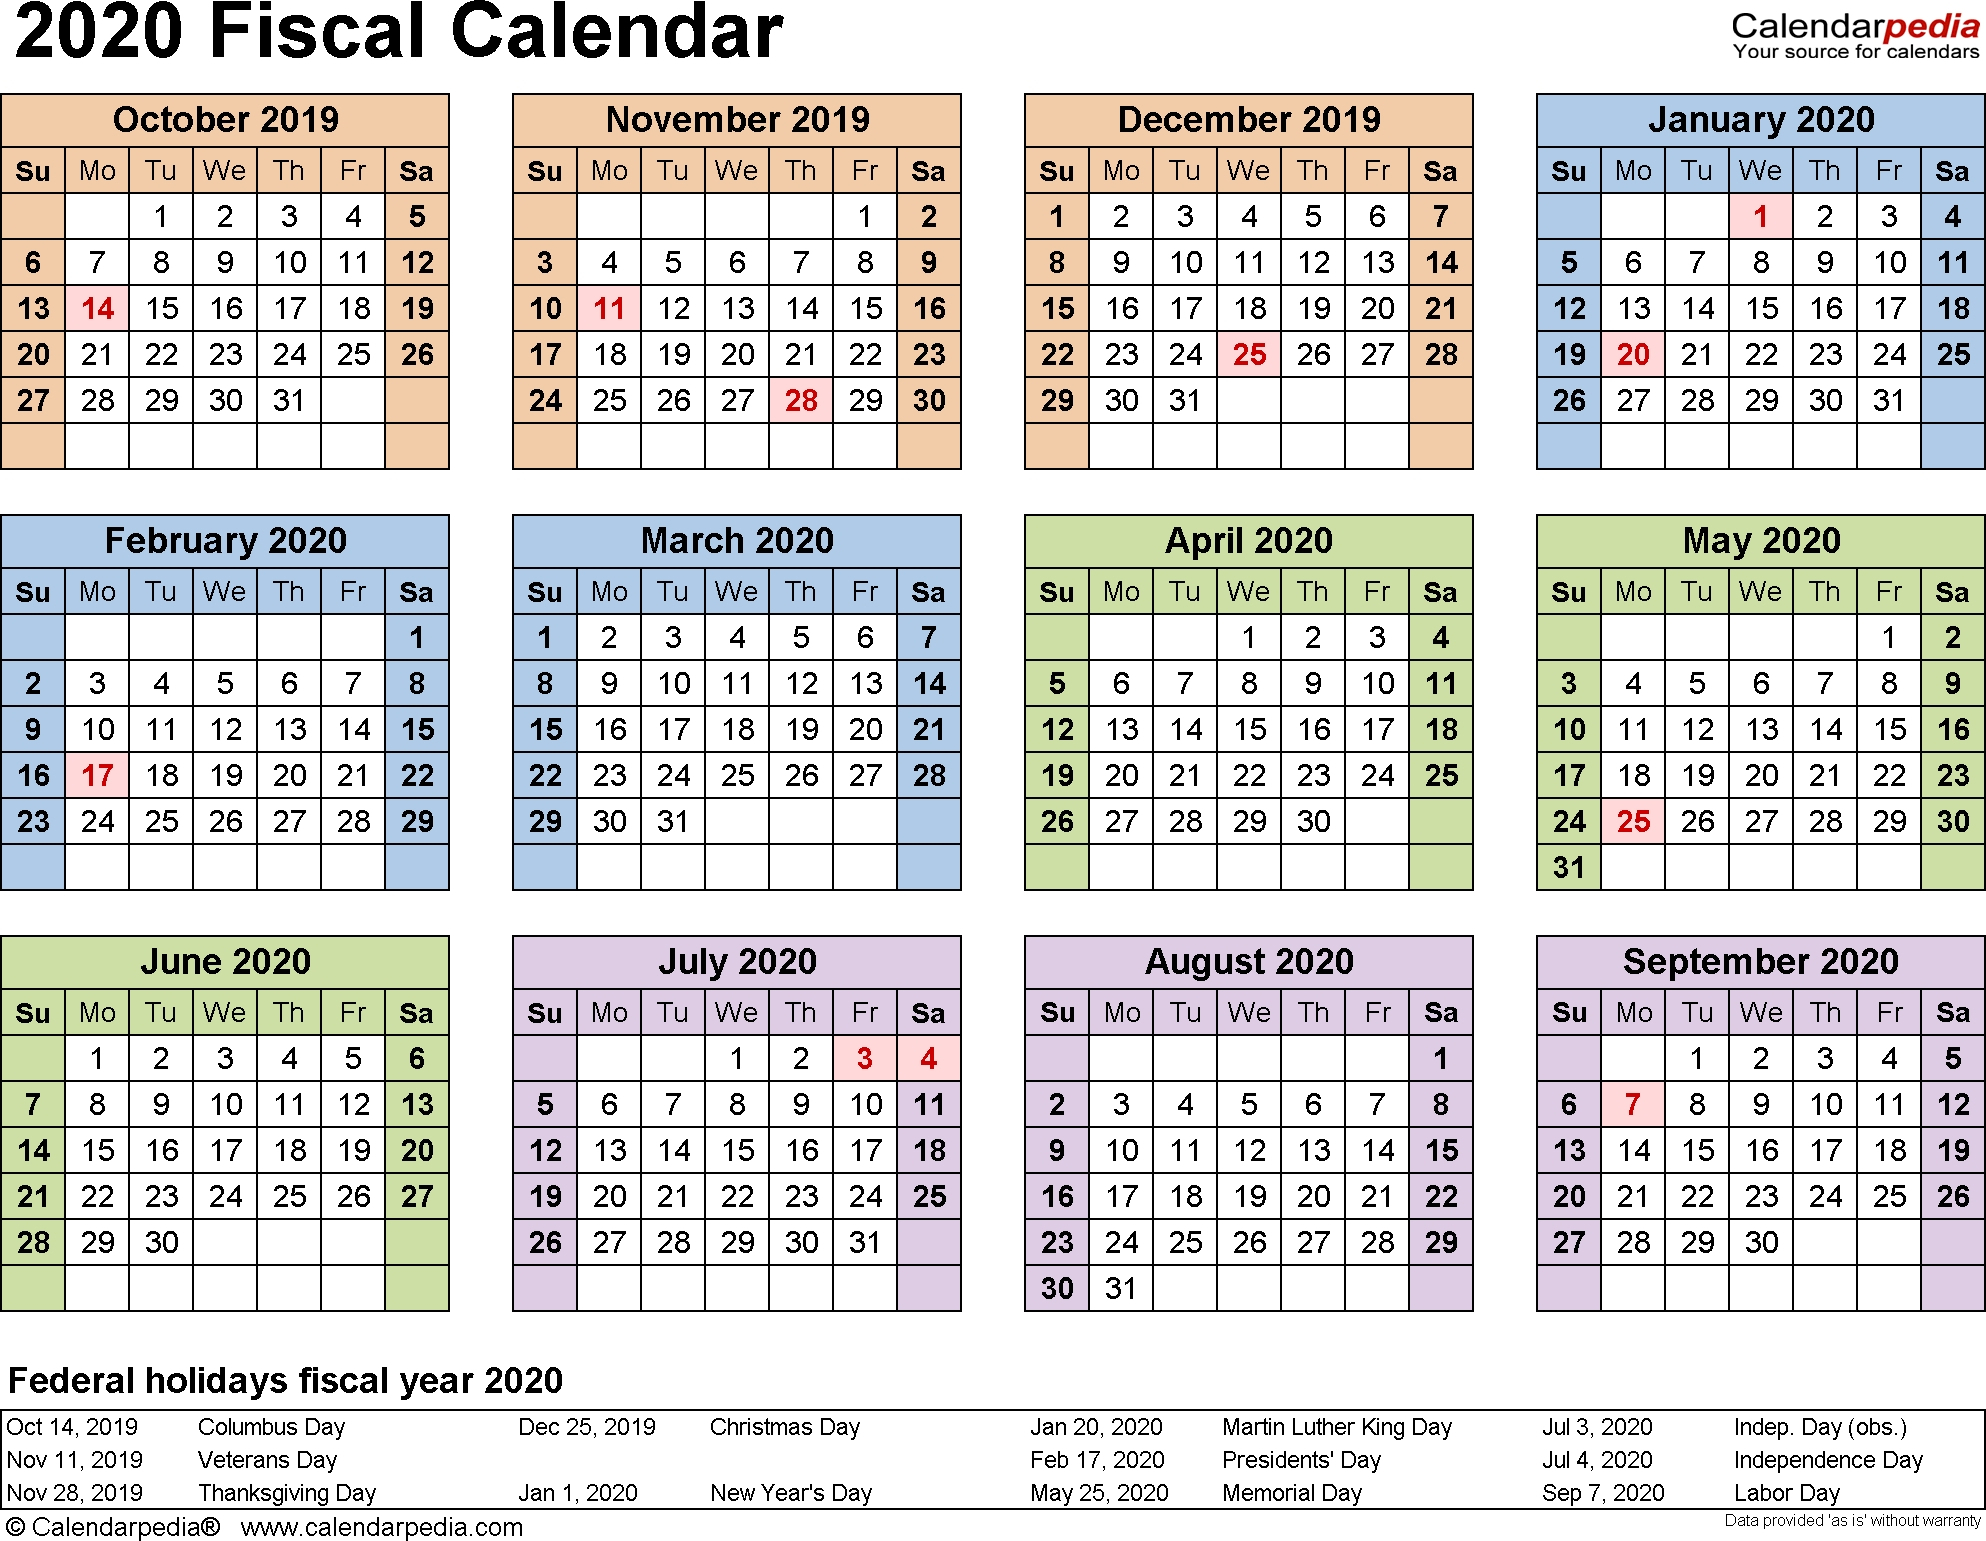 2020 Biweekly Pay Calendar Template | Example Calendar